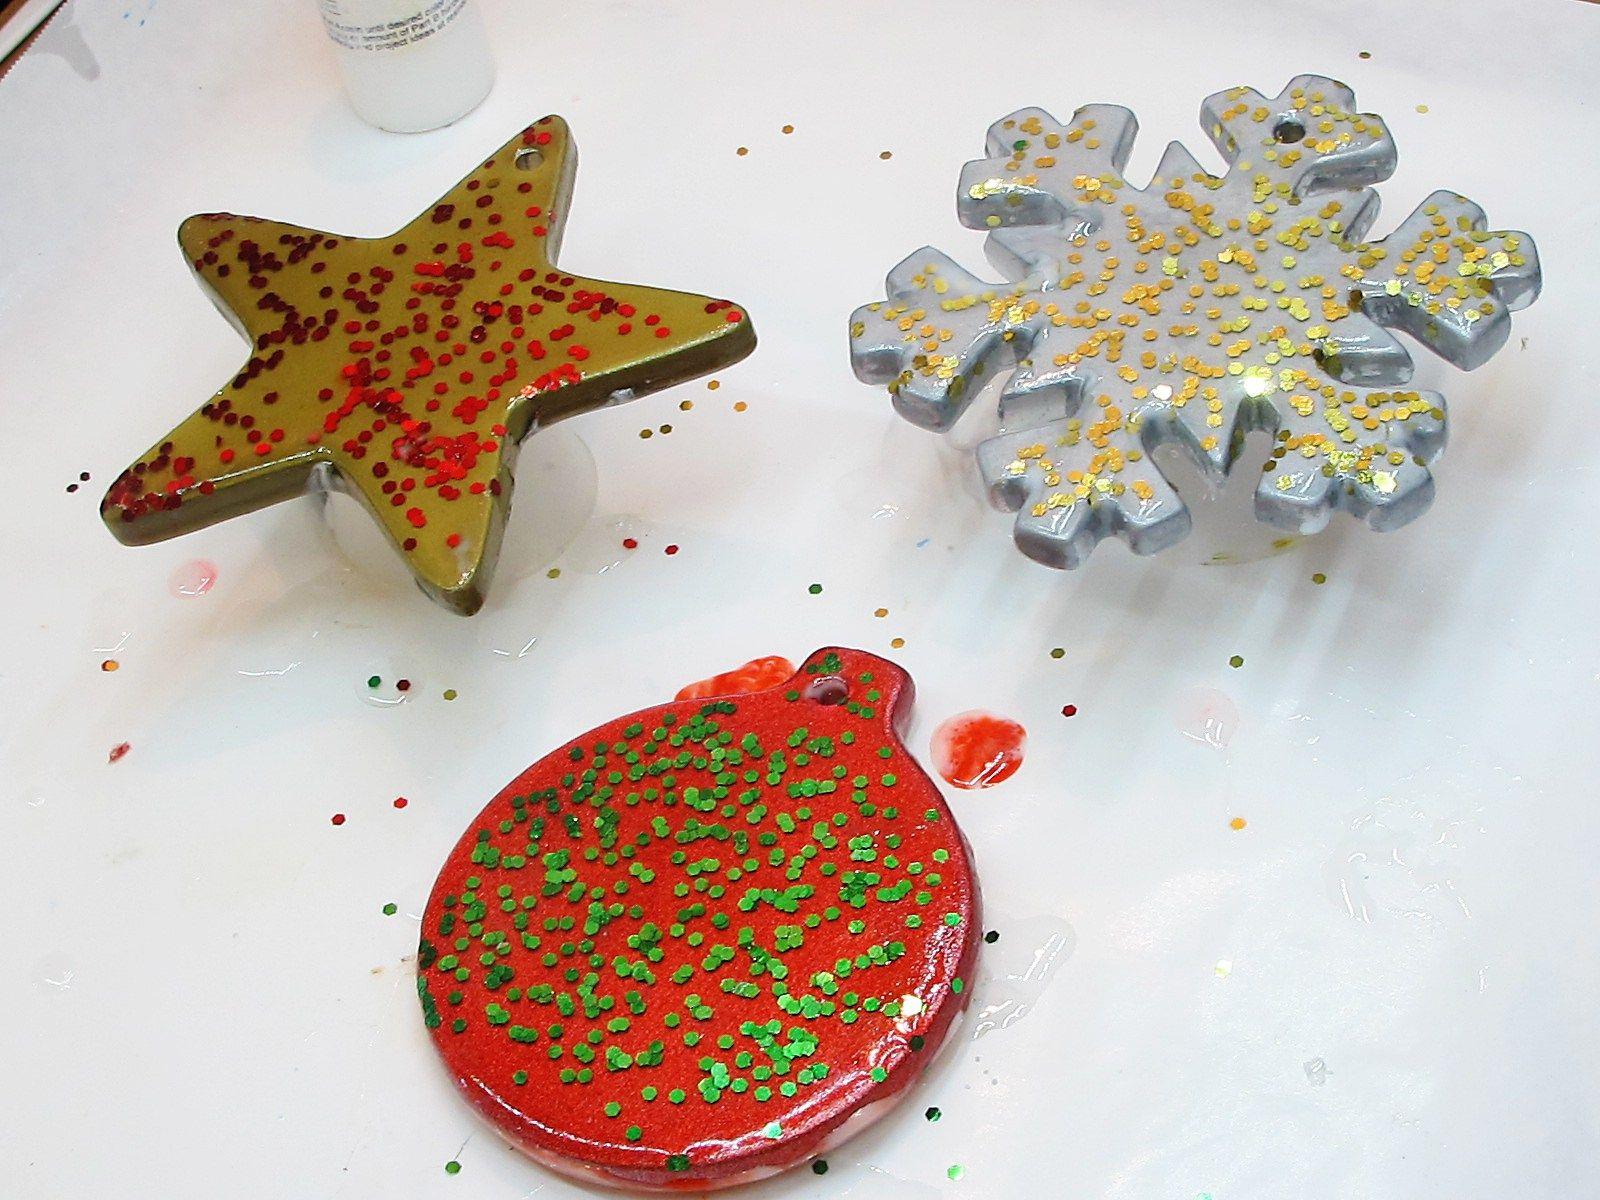 Mini Wreath Christmas Ornaments Handmade Alcohol Ink Resin Christmas Ornaments Mini Wreaths Christmas Handmade Christmas Ornaments Unique Christmas Ornaments